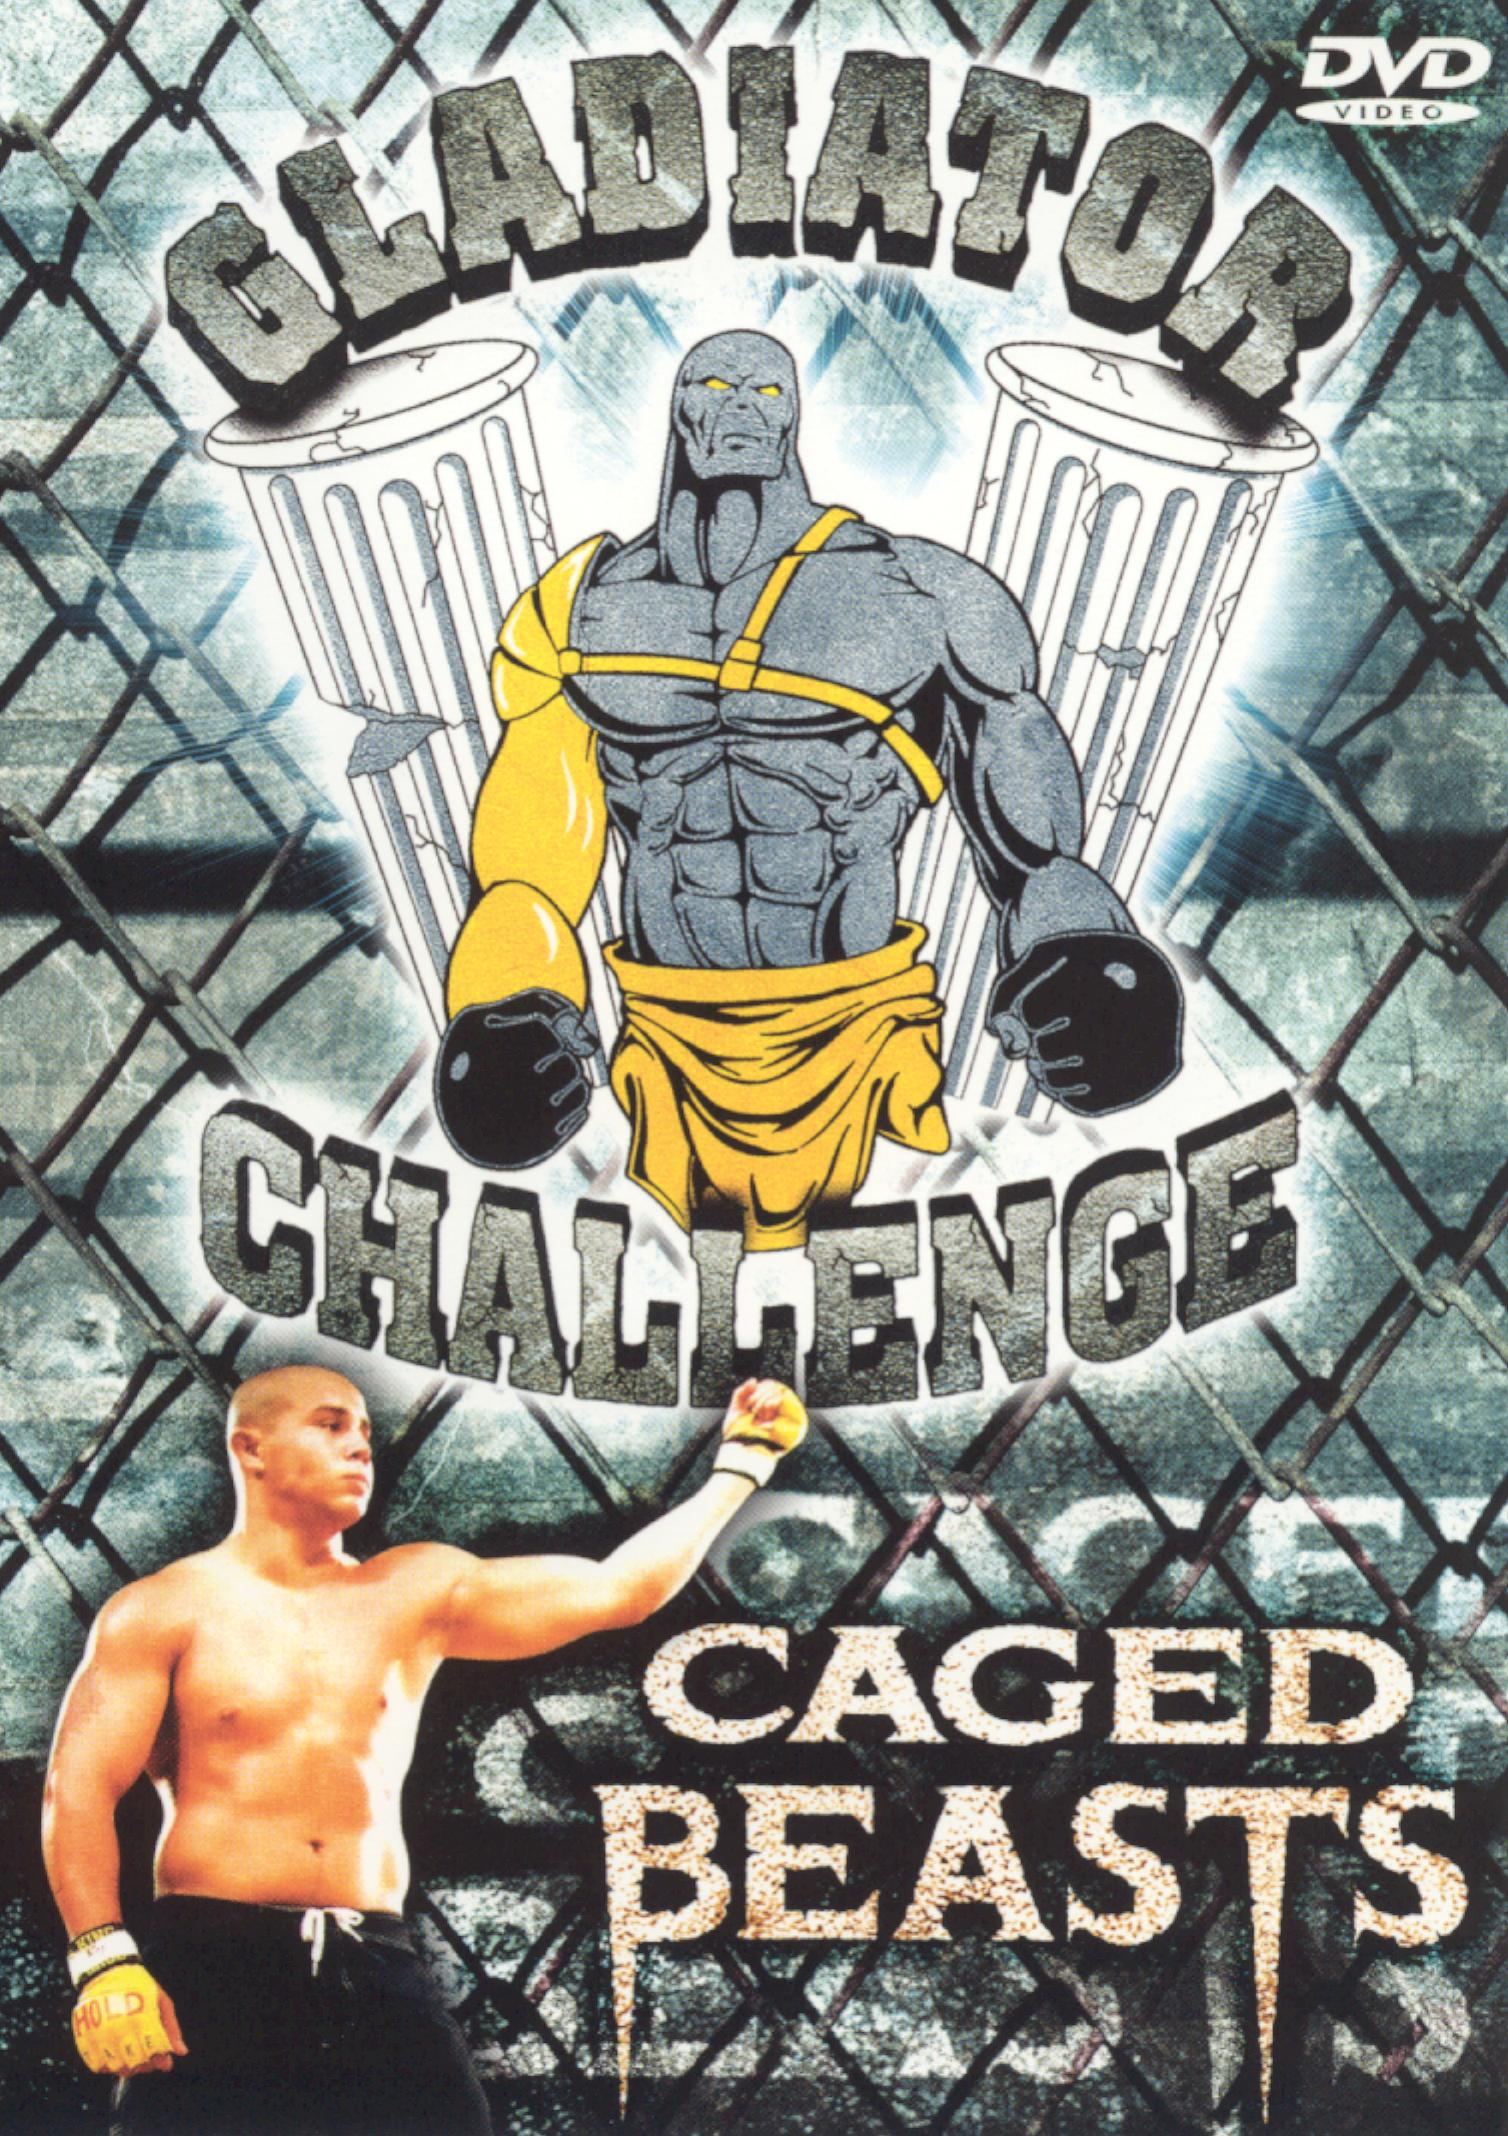 Gladiator Challenge: Caged Beasts